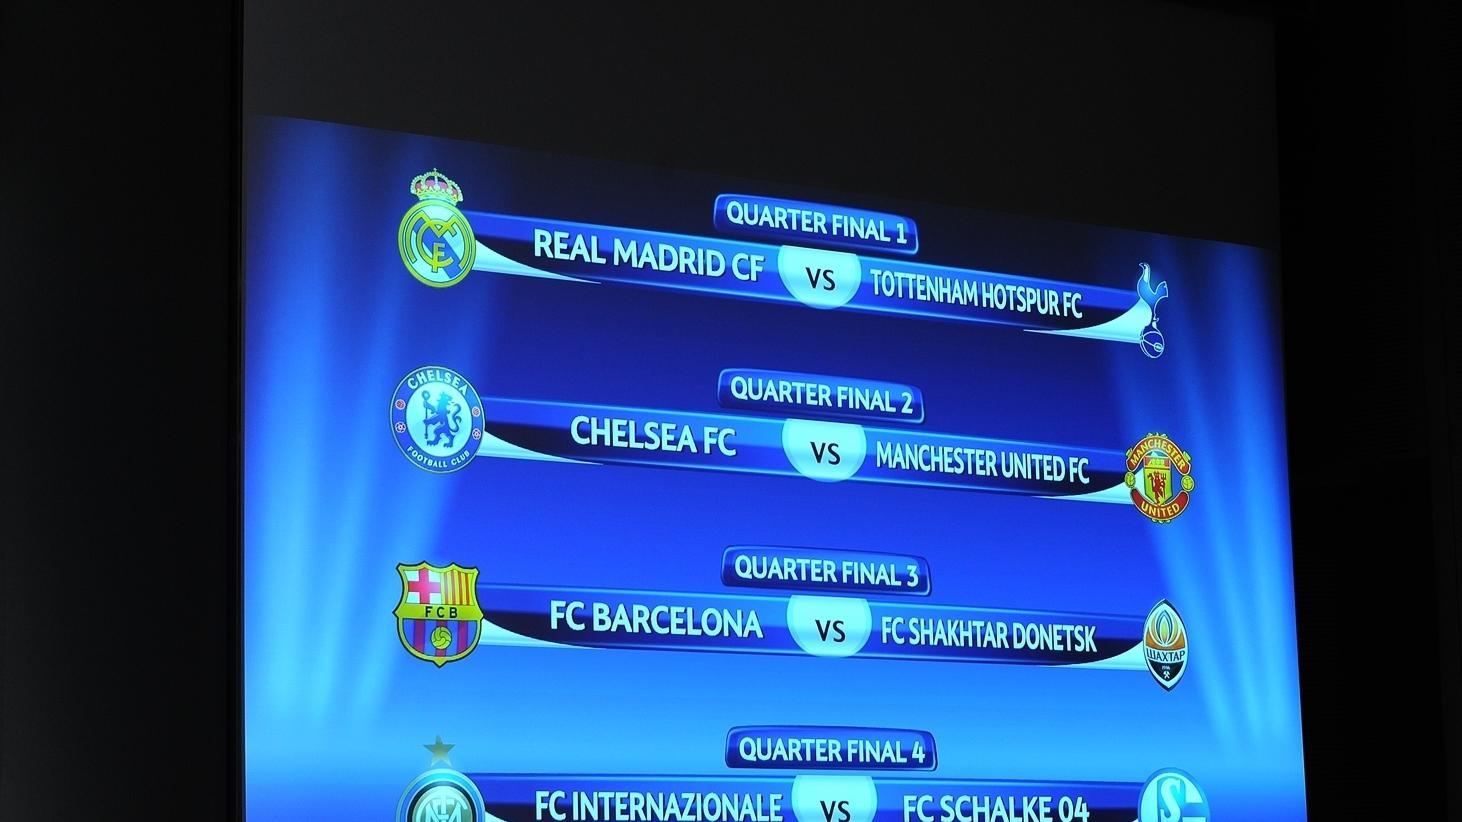 champions league quarter final draw uefa champions league uefa com champions league quarter final draw